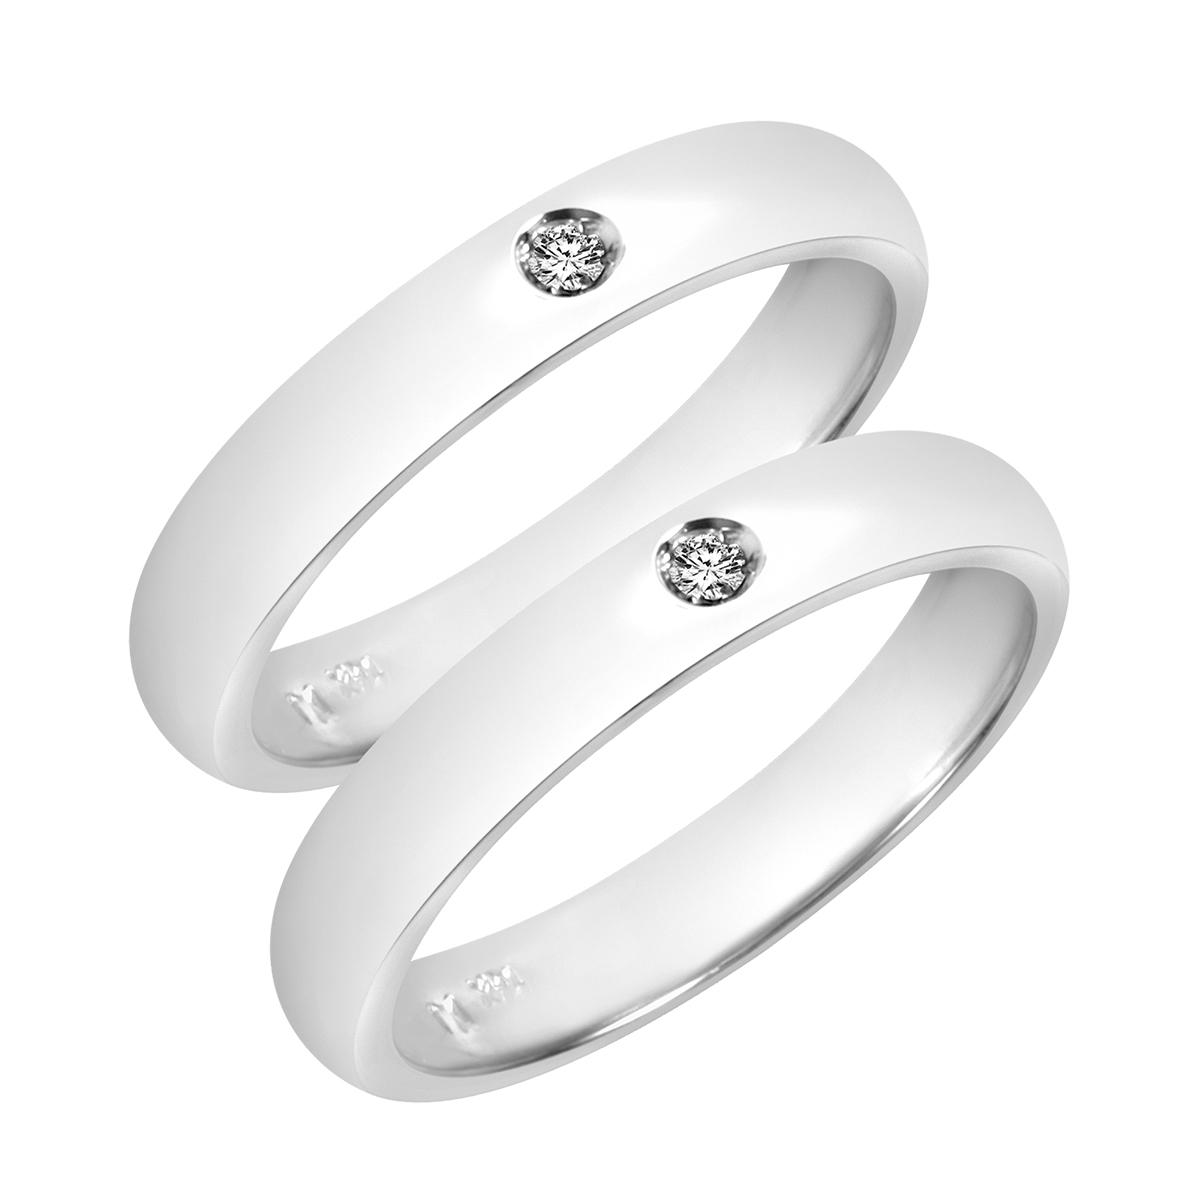 1/10 CT. T.W. Round Cut Mens  Same Sex Wedding Band Set 14K white Gold- Size 8